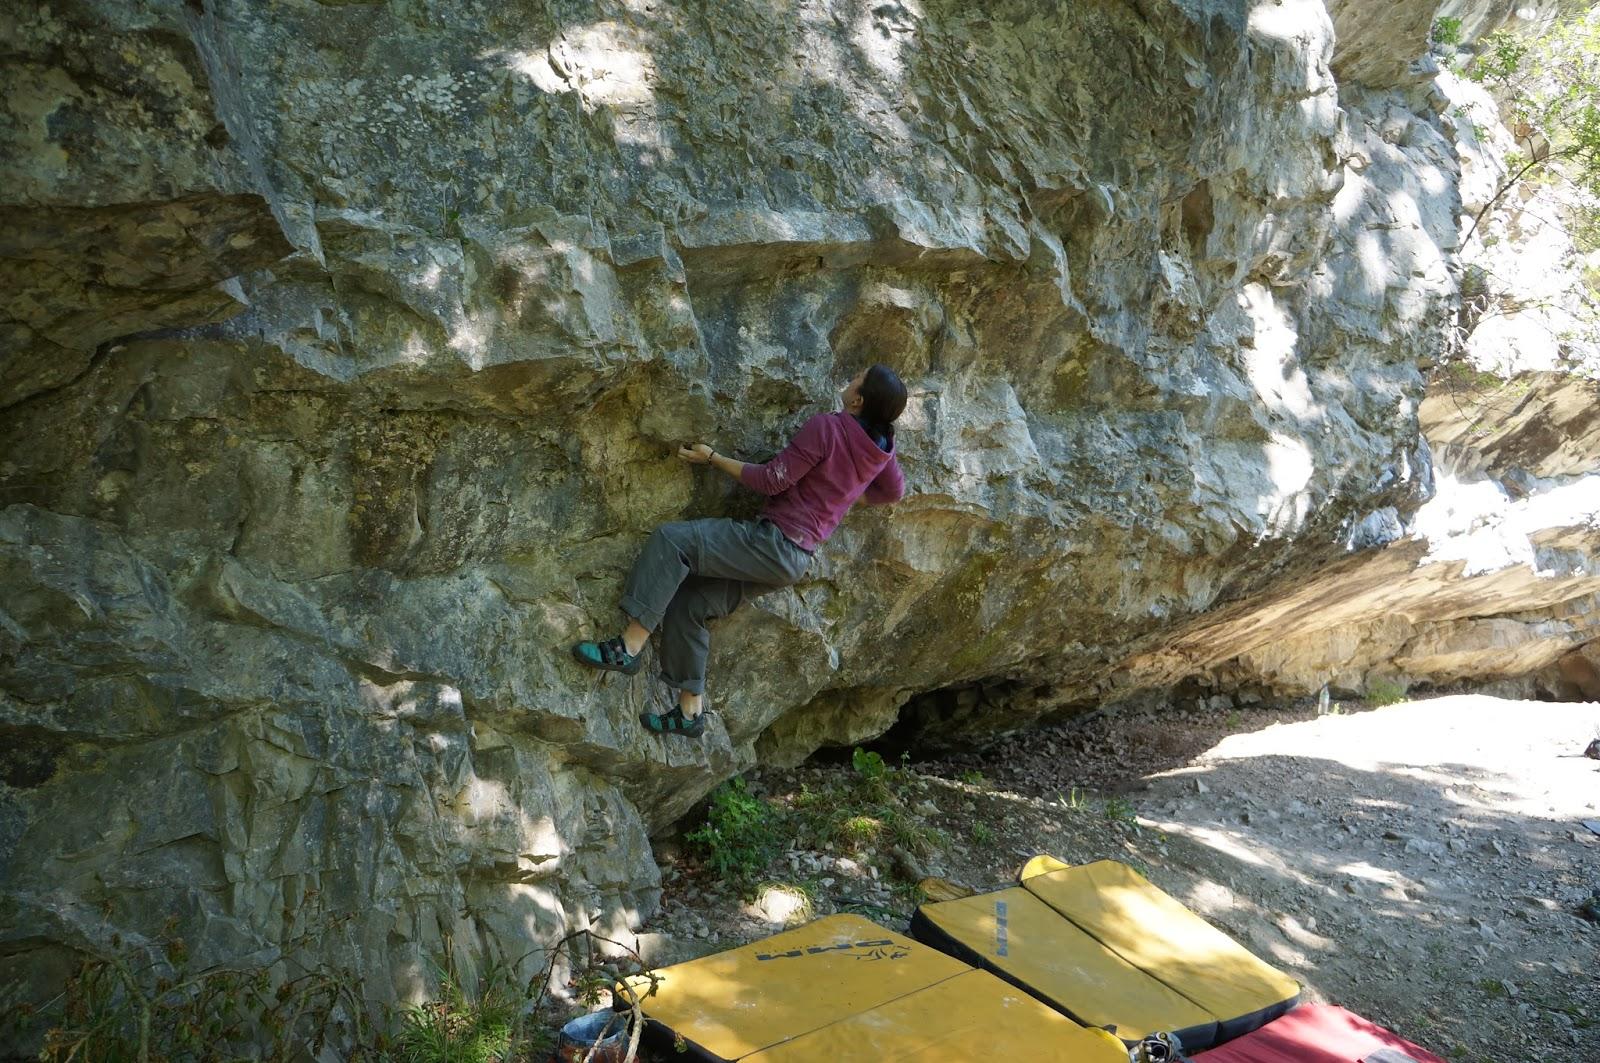 climbing, bouldering, wales, uk, pantywmym, clwyd, mold, steep, limestone, ukc